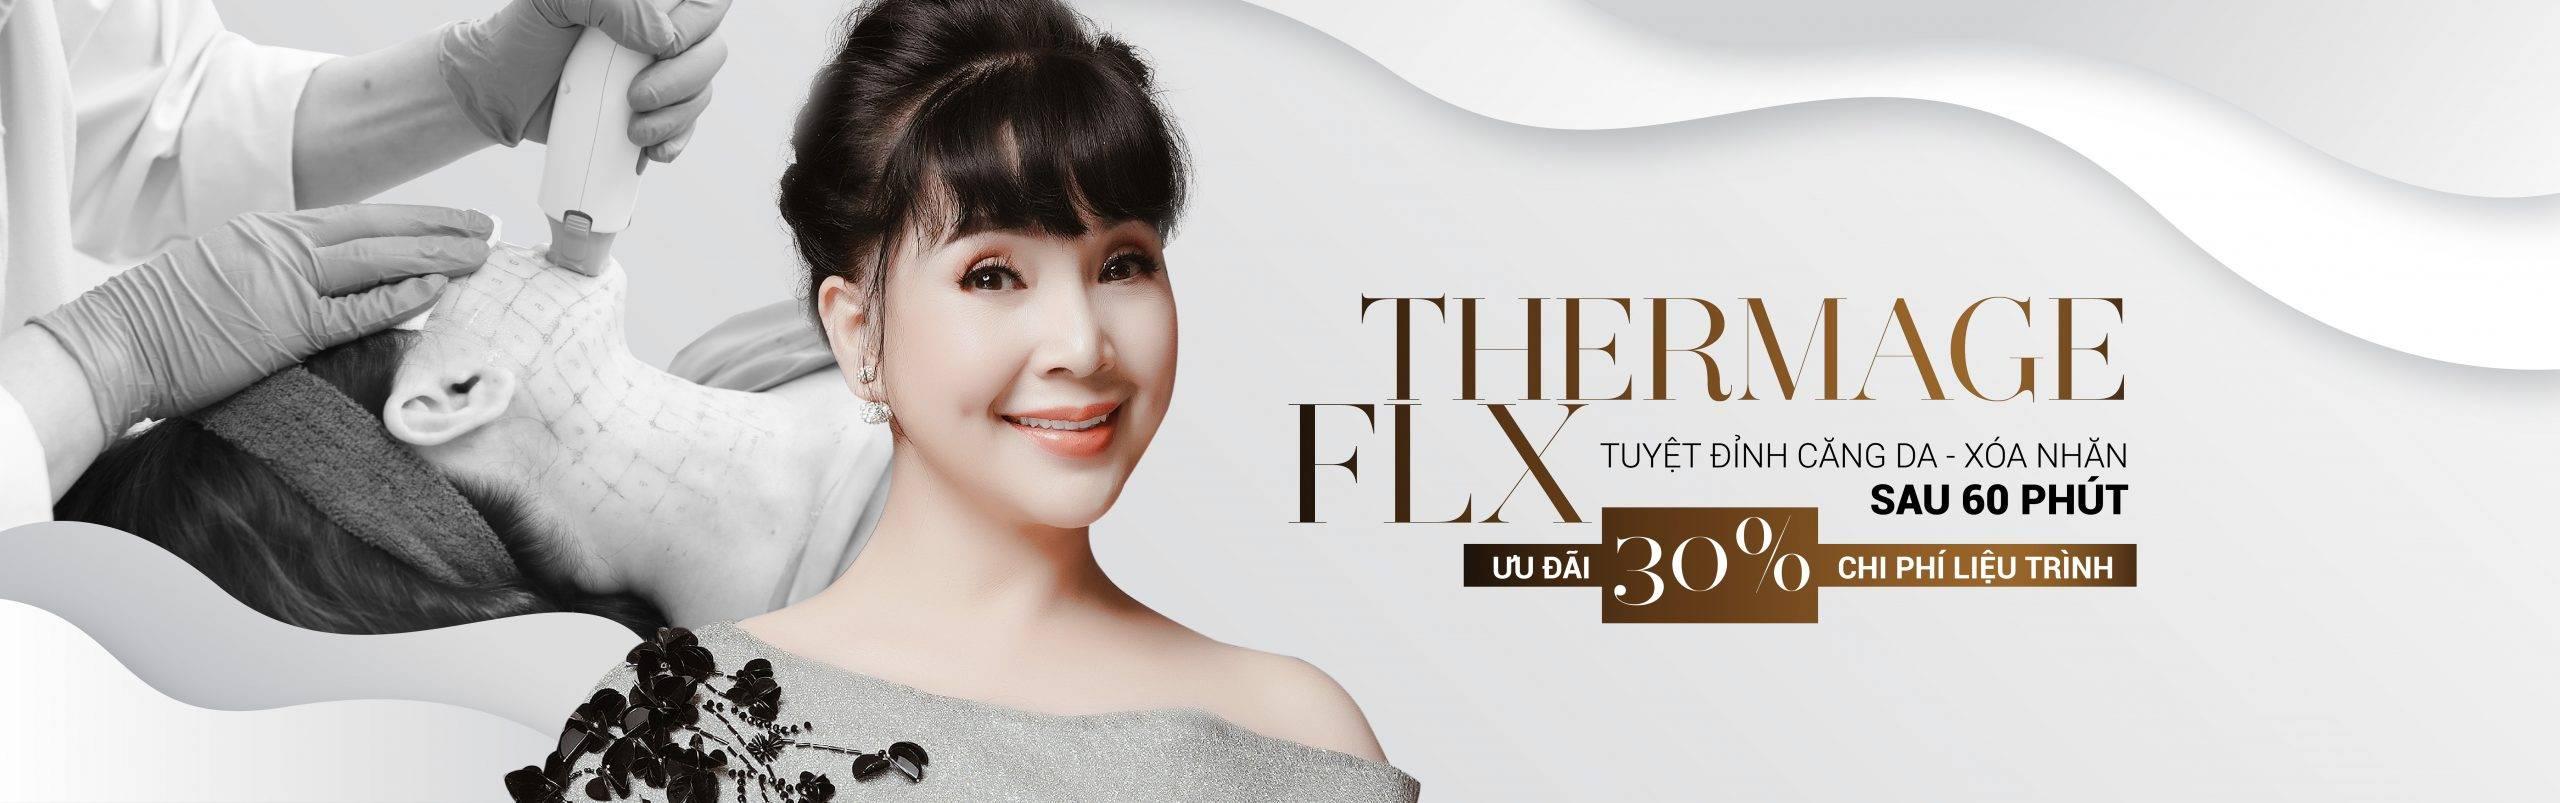 thermage-flx-tuyet-dinh-xoa-nhan-cang-da-chung-nao-banner